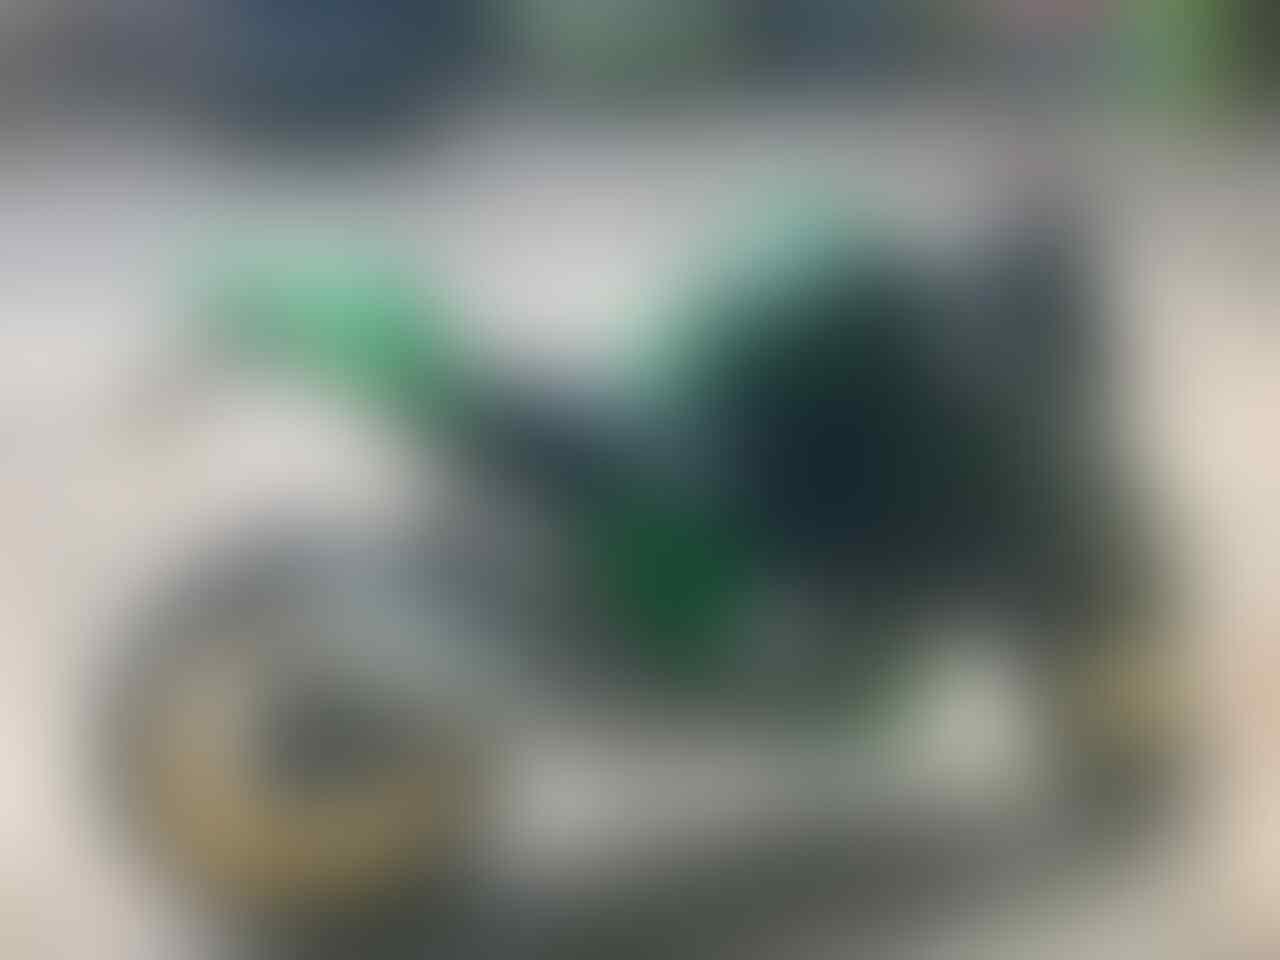 [Share]Serba-Serbi Kawasaki Supersport Z + ZX Series (Z800,Z1000, ZX636,ZX10,ZX14)